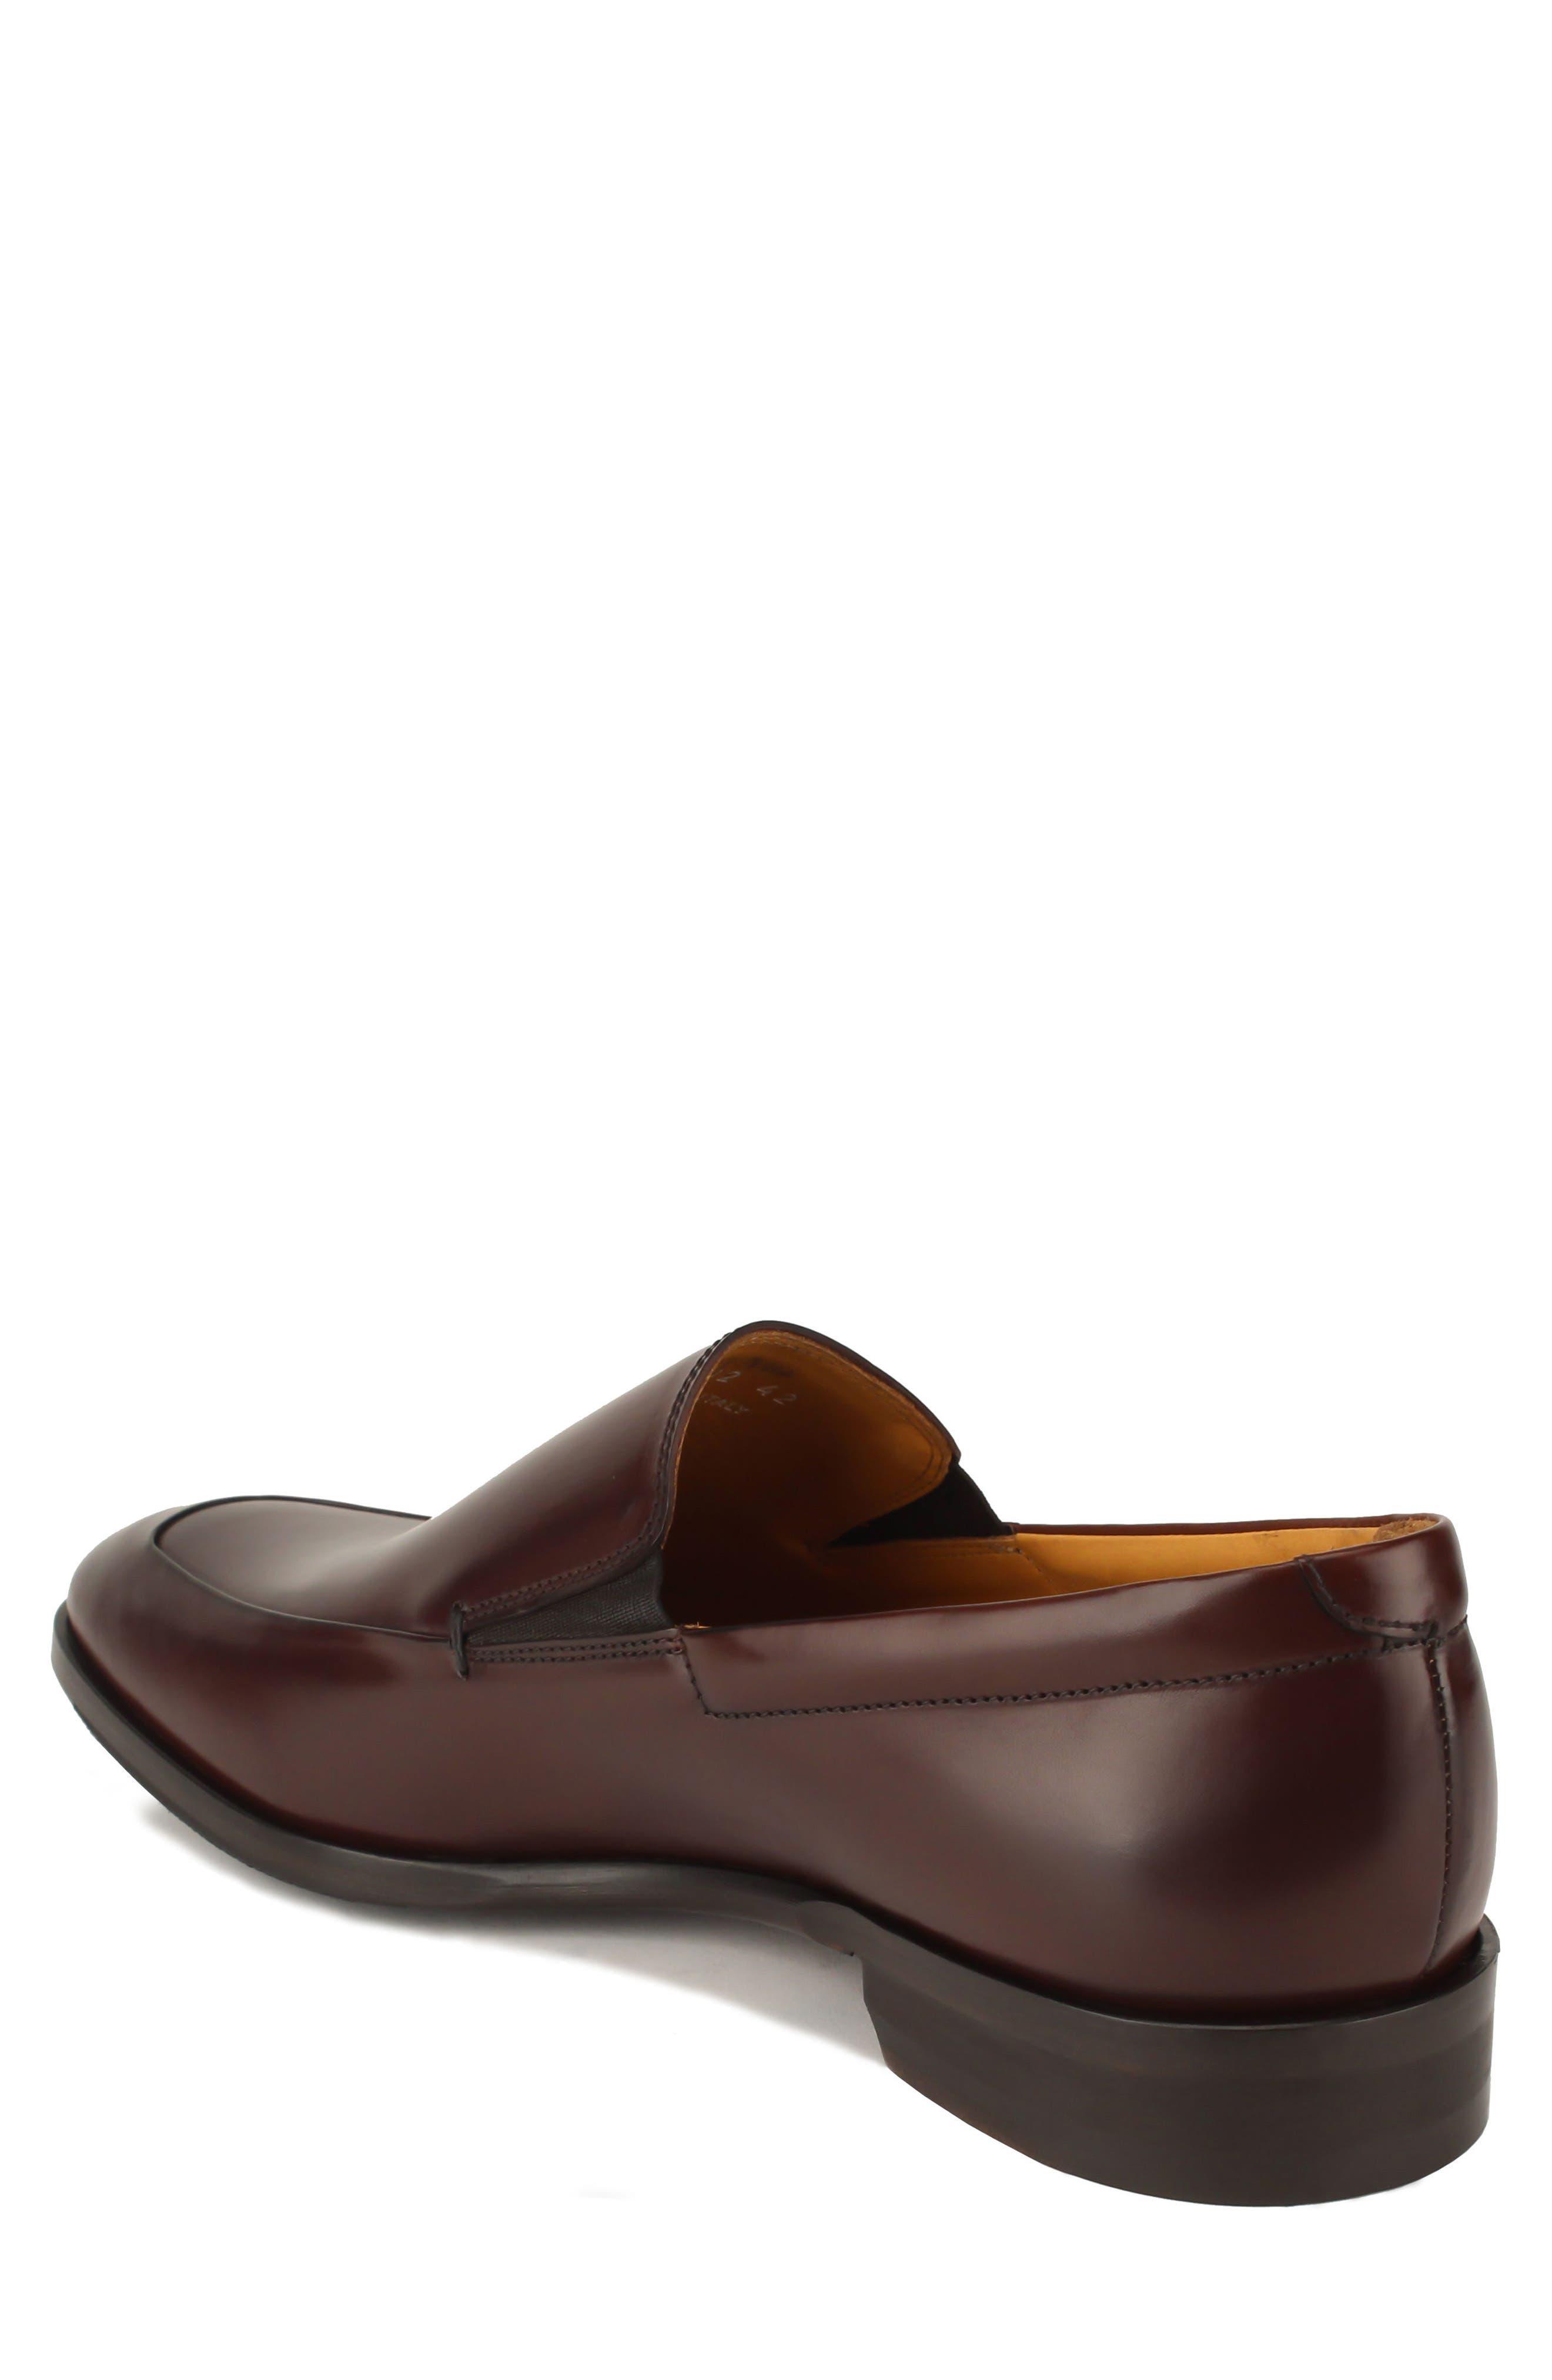 Brighton II Venetian Loafer,                             Alternate thumbnail 2, color,                             Bourbon Leather